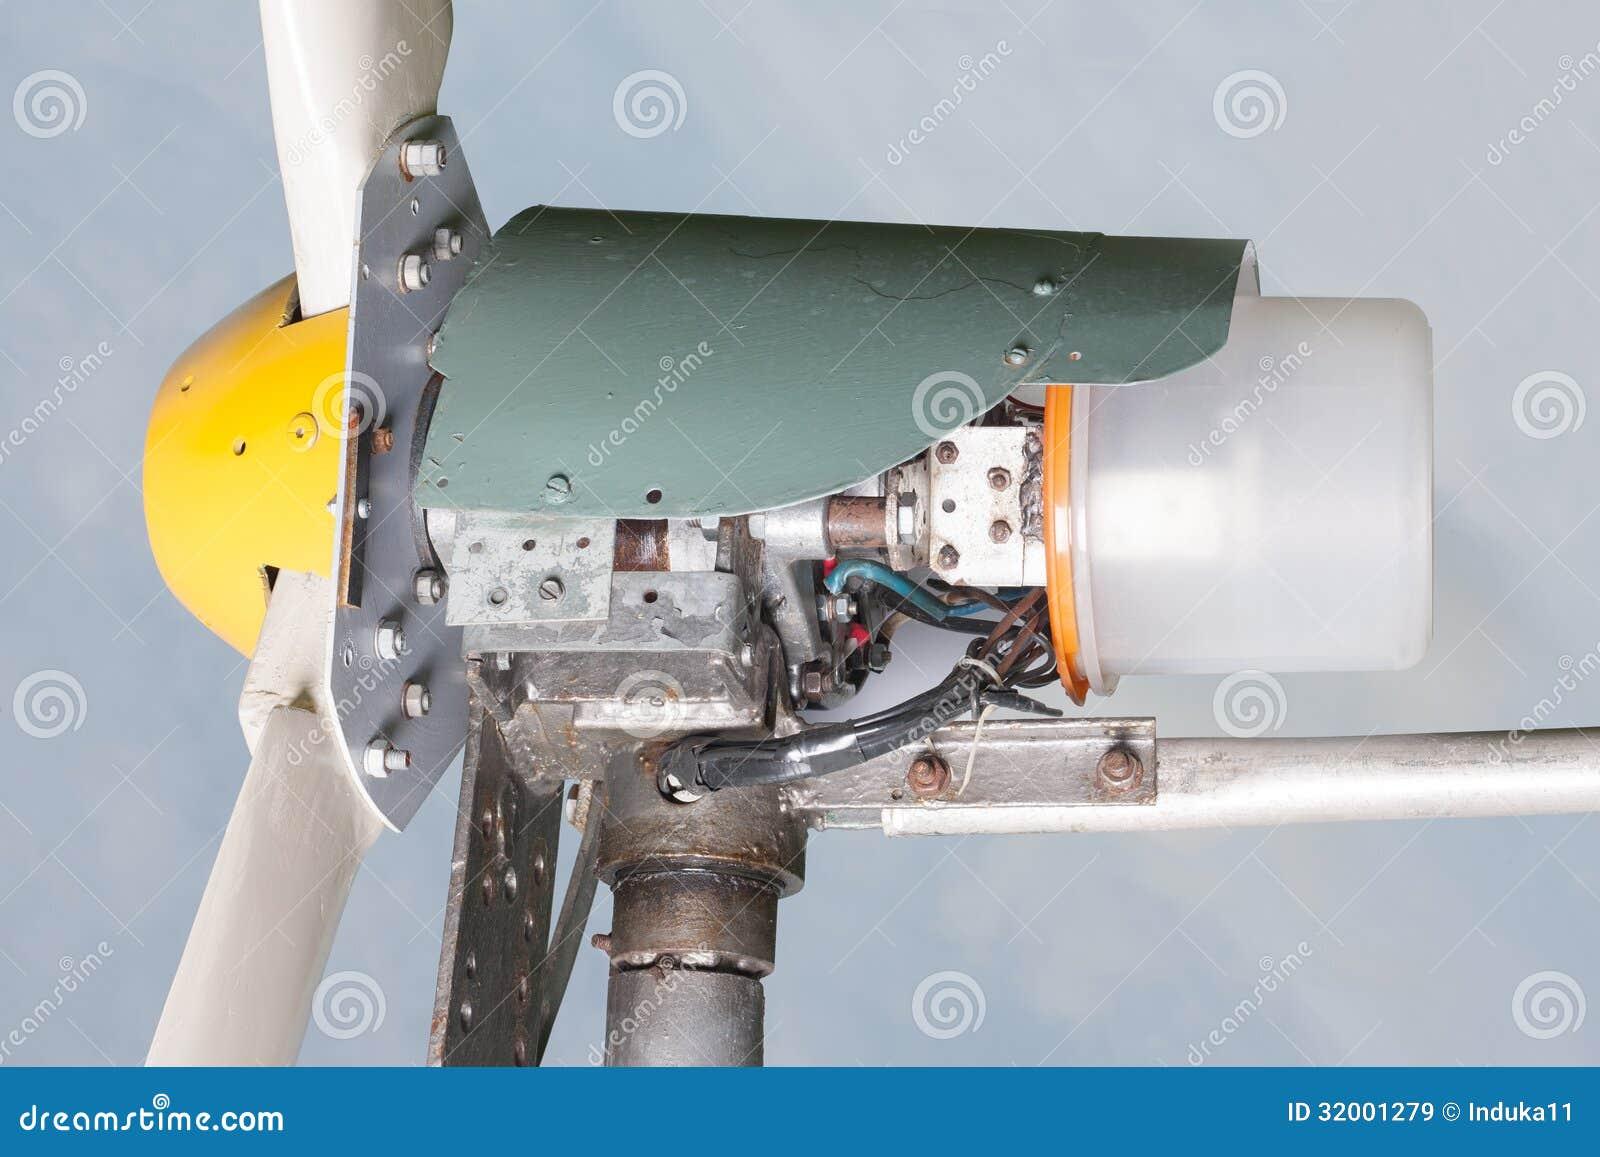 Homemade generator Small Homemade Wind Generator Dreamstimecom Homemade Wind Generator Stock Image Image Of Up Macro 32001279